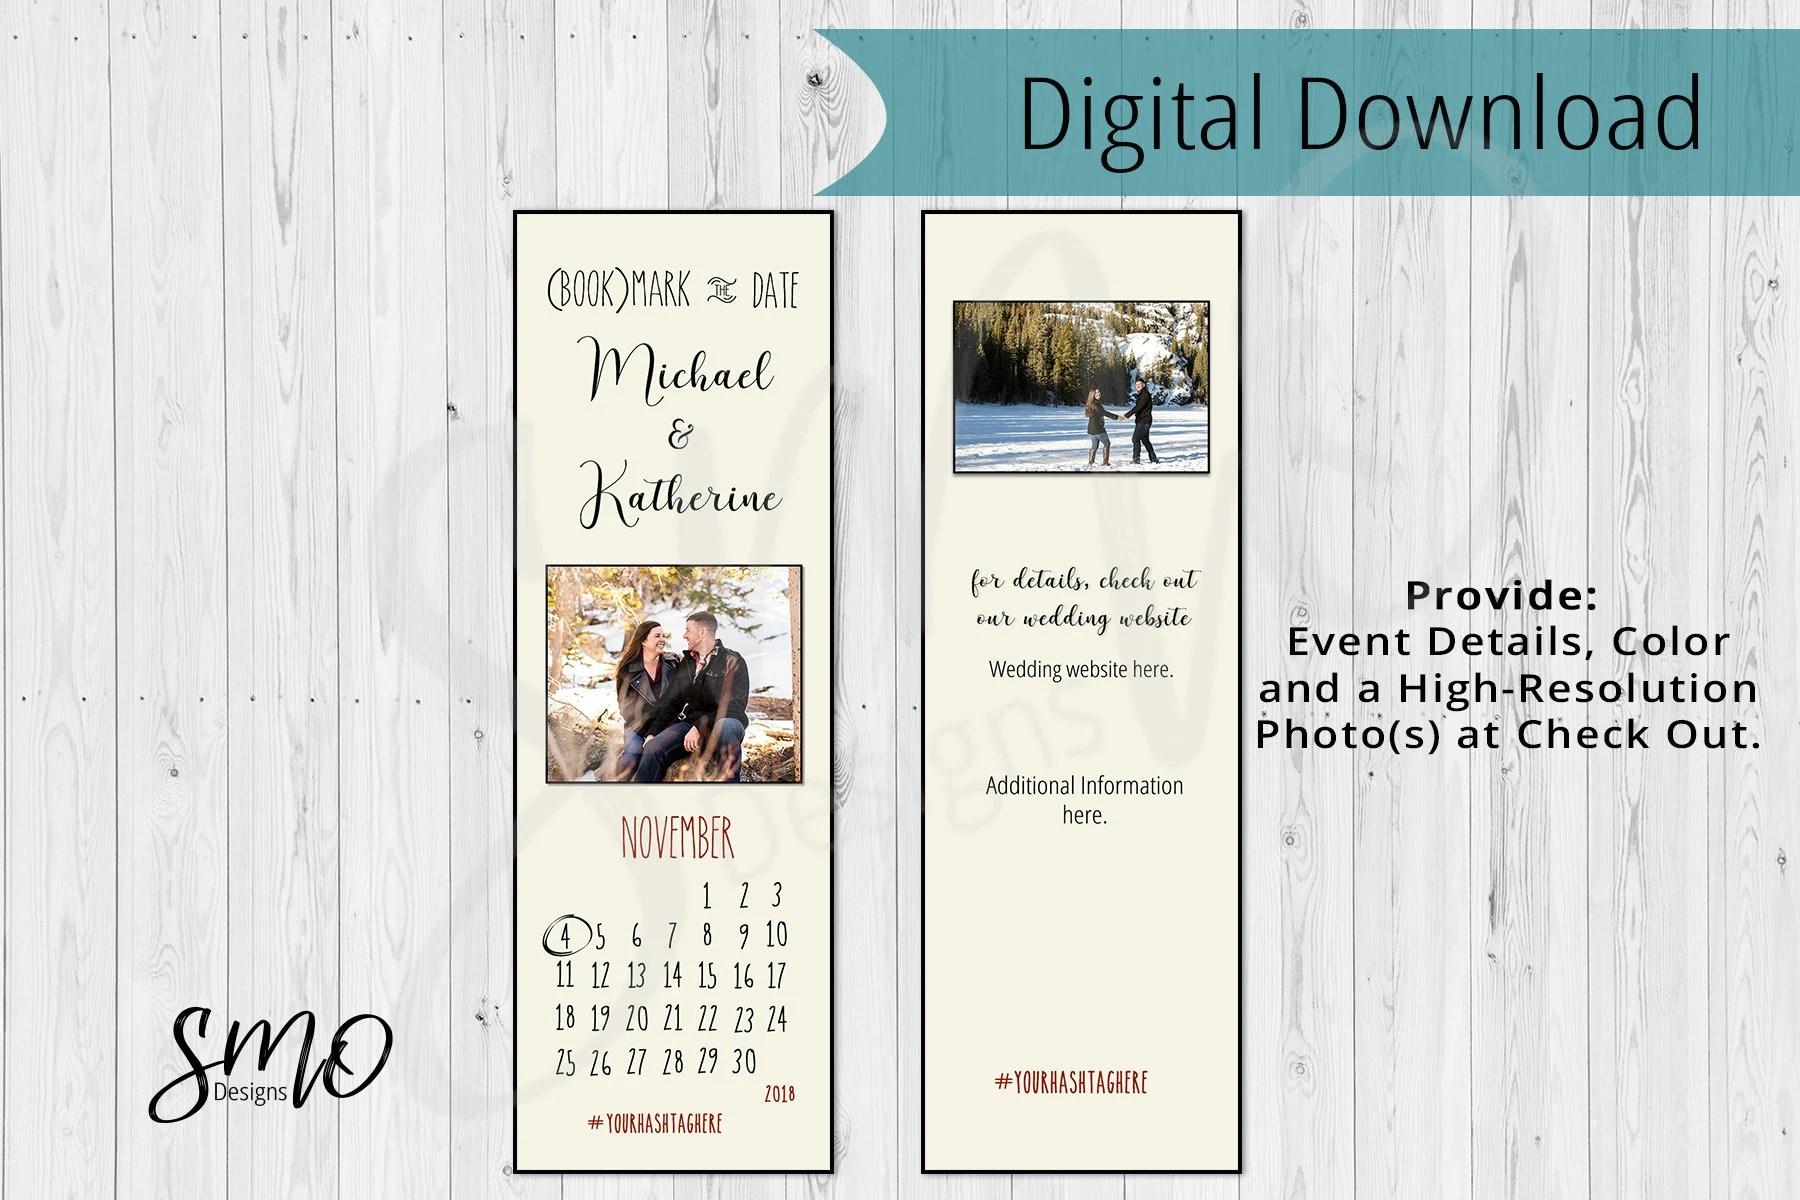 Save the Date Calendar Invitation Bookmark size Wedding Etsy